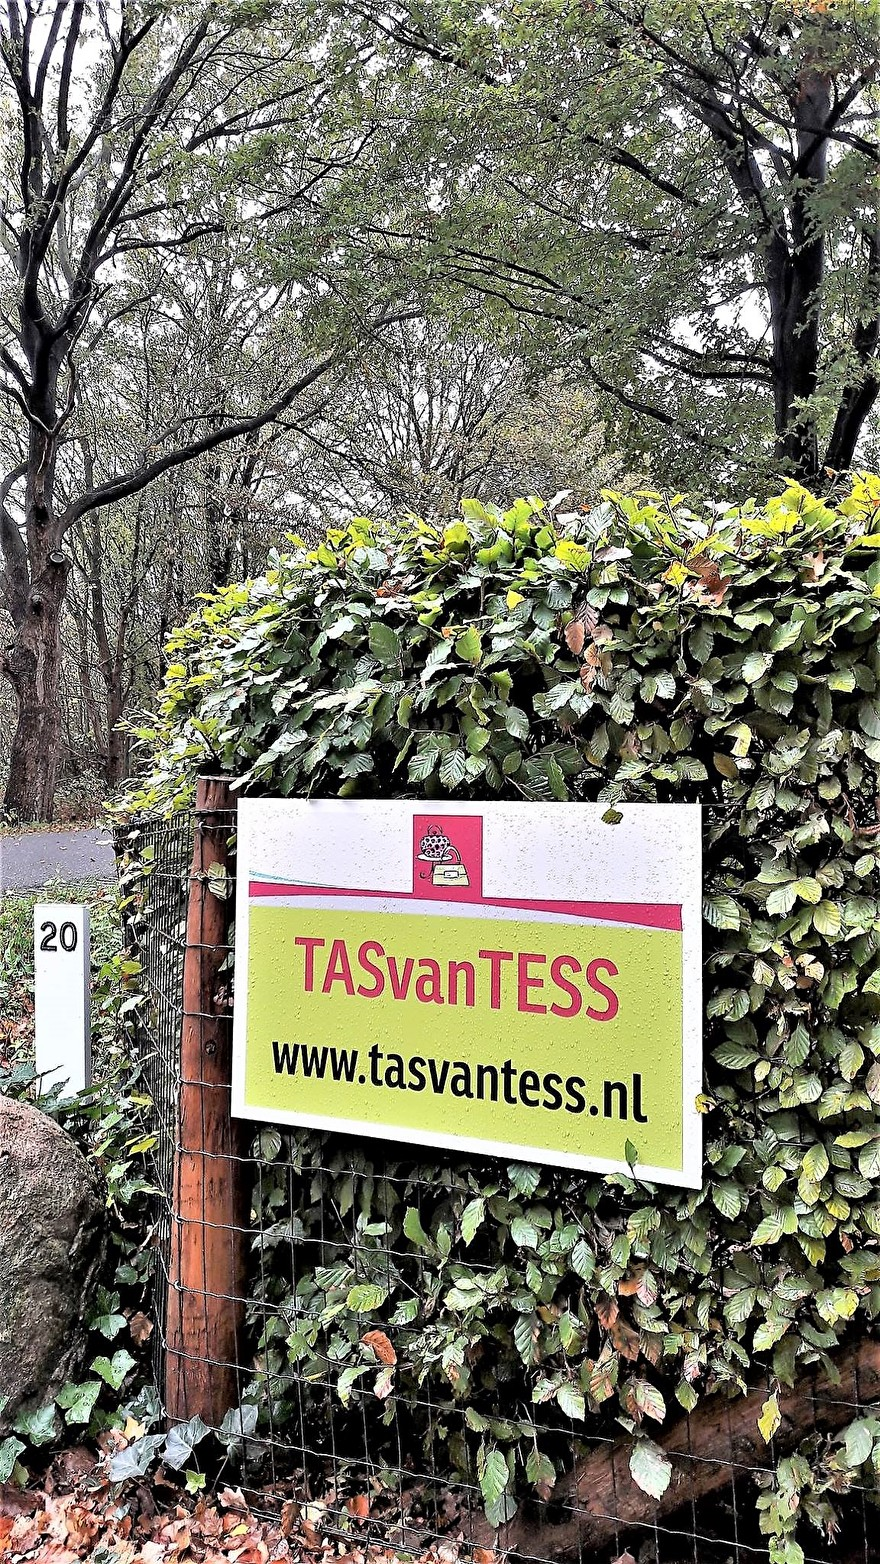 TASvanTESS!